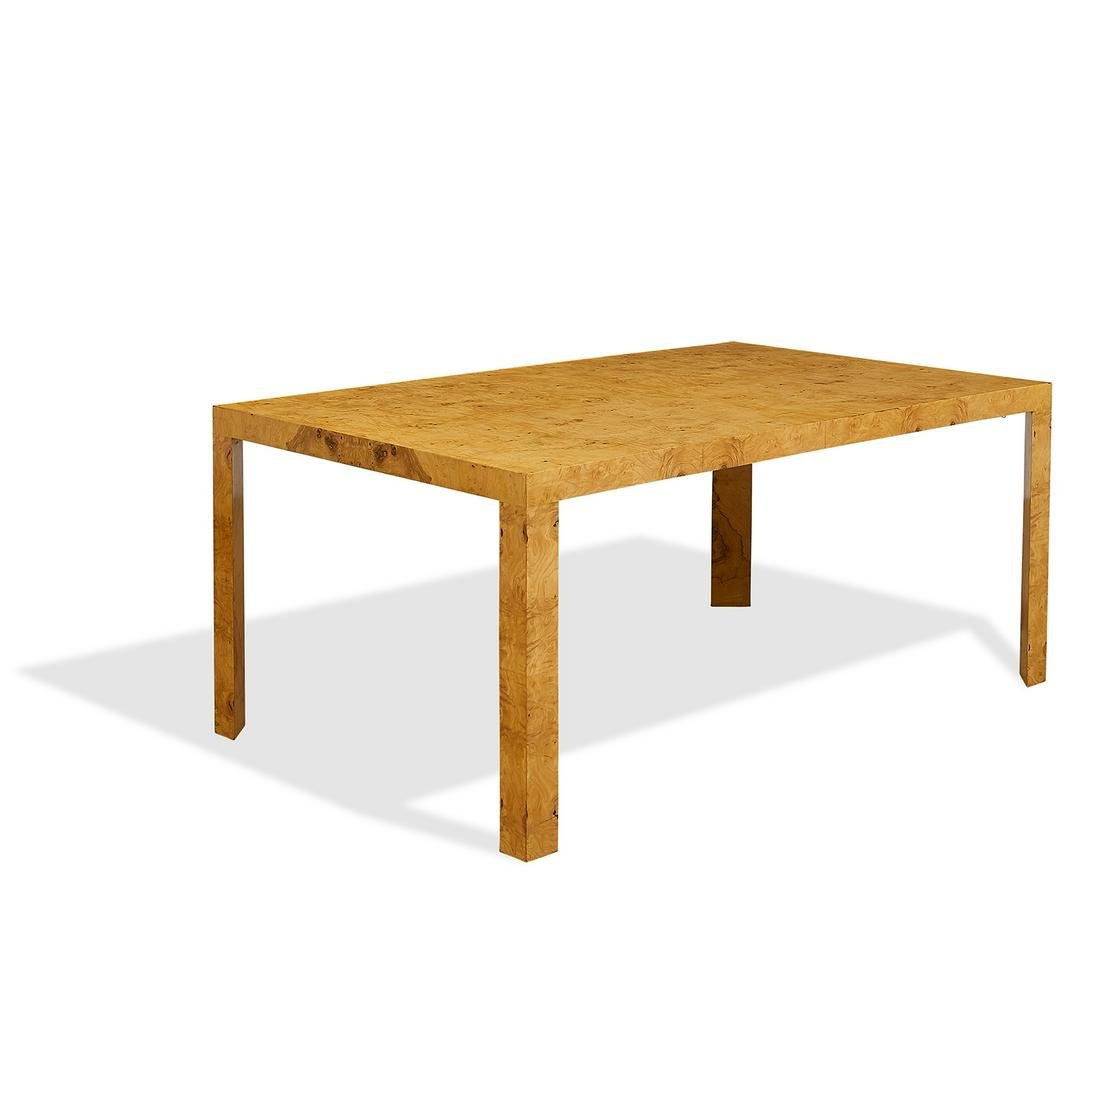 Roger Sprunger for Dunbar dining table, #7110